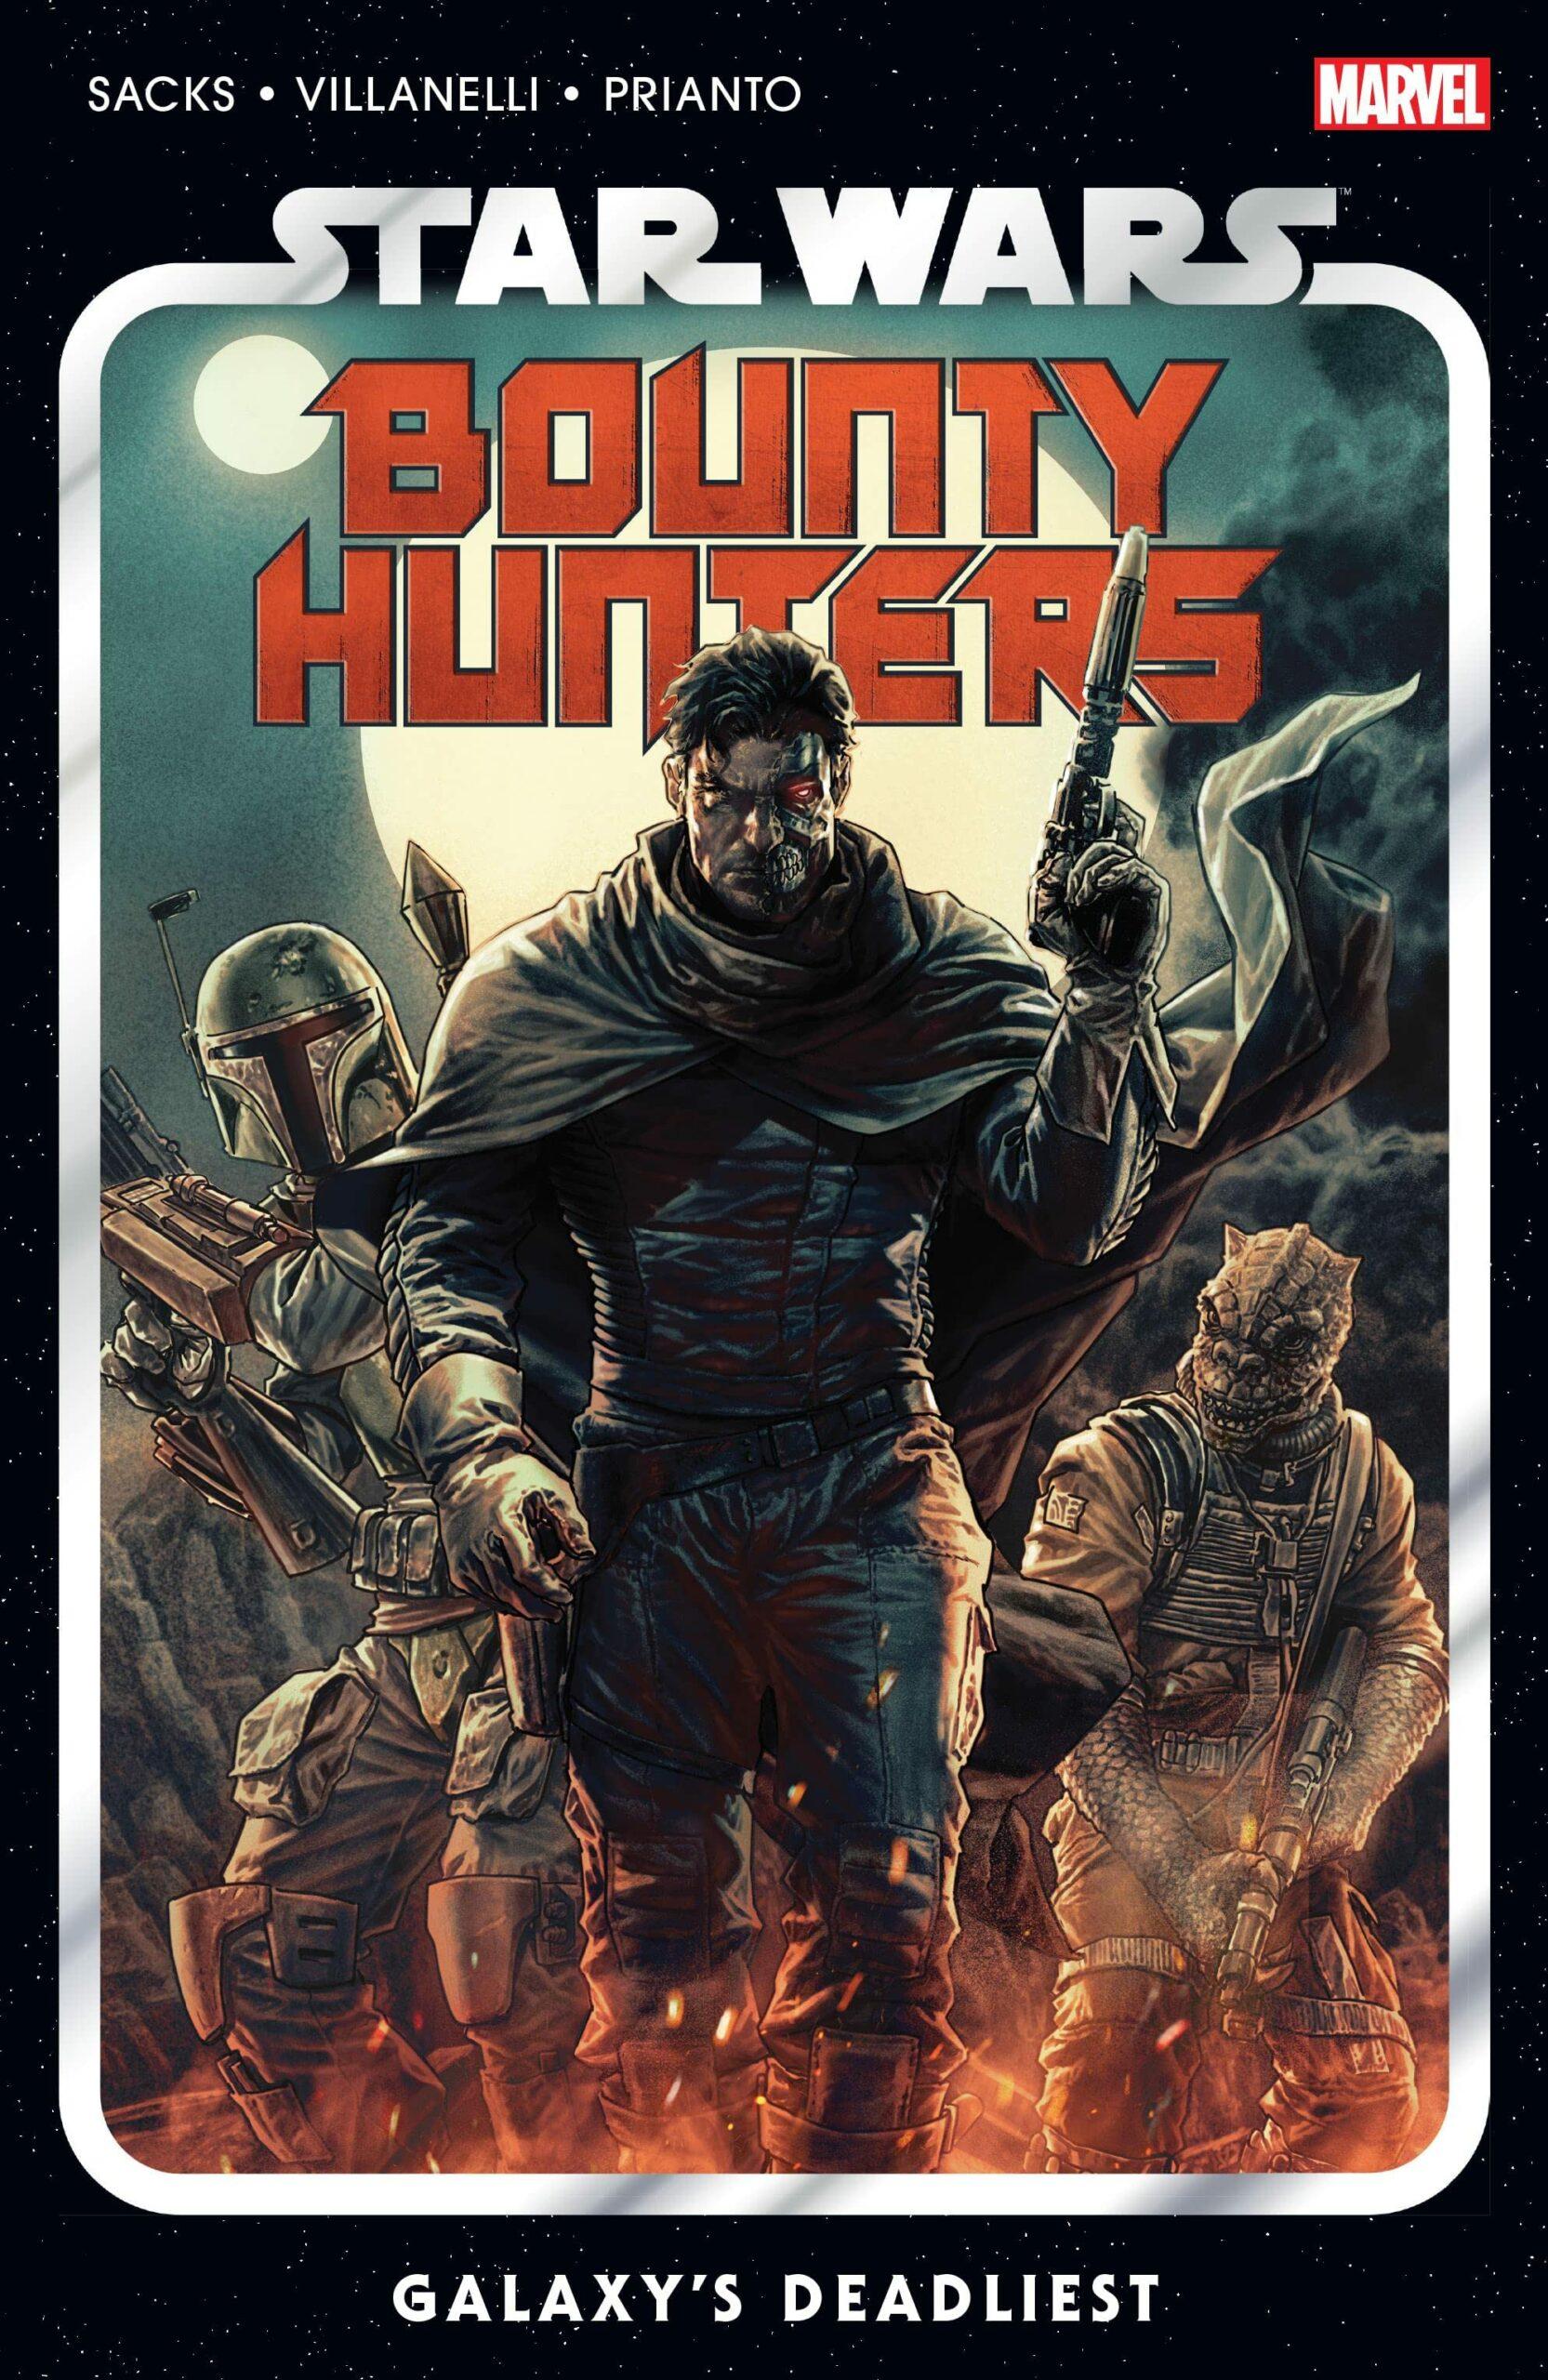 Bounty Hunters of the Star Wars comics universe